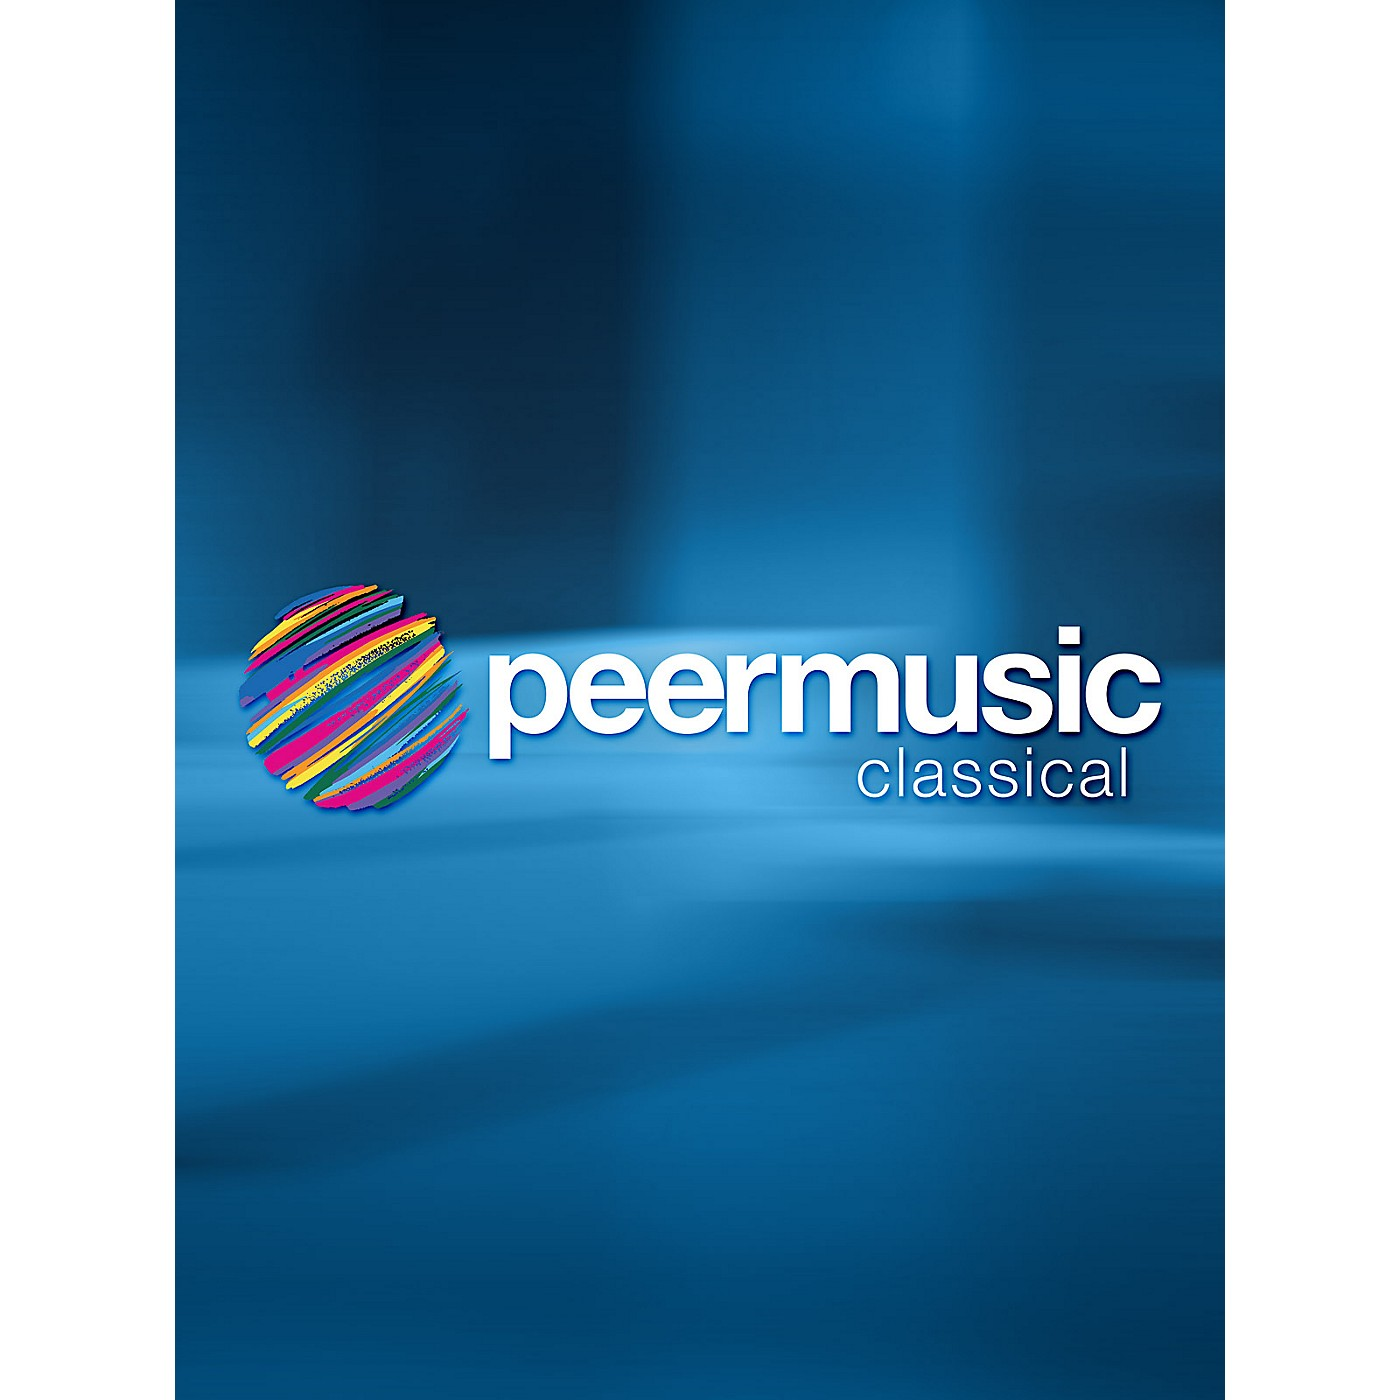 Peer Music 3 New Carols for Christmas (Treble Chorus, Percussion, Bass Guitar, Piano) SSA Composed by Carman Moore thumbnail